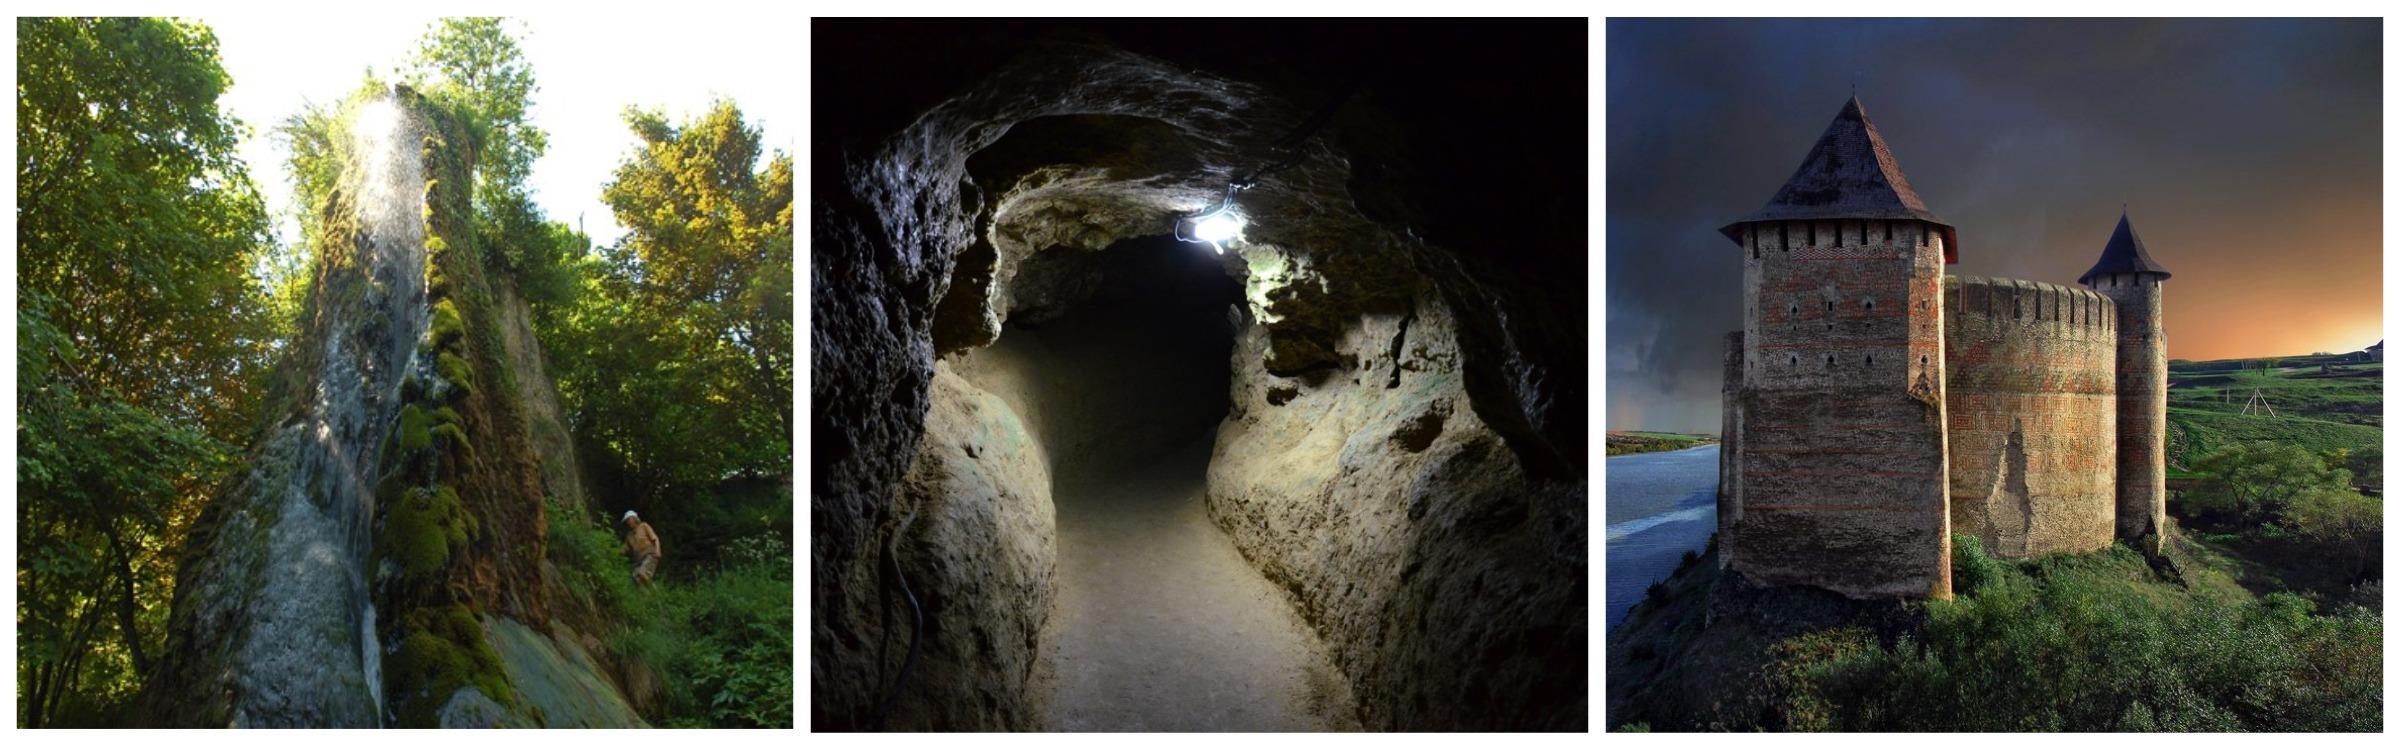 водоспад-каплиця, печера Кришталева, фортеця Хотин